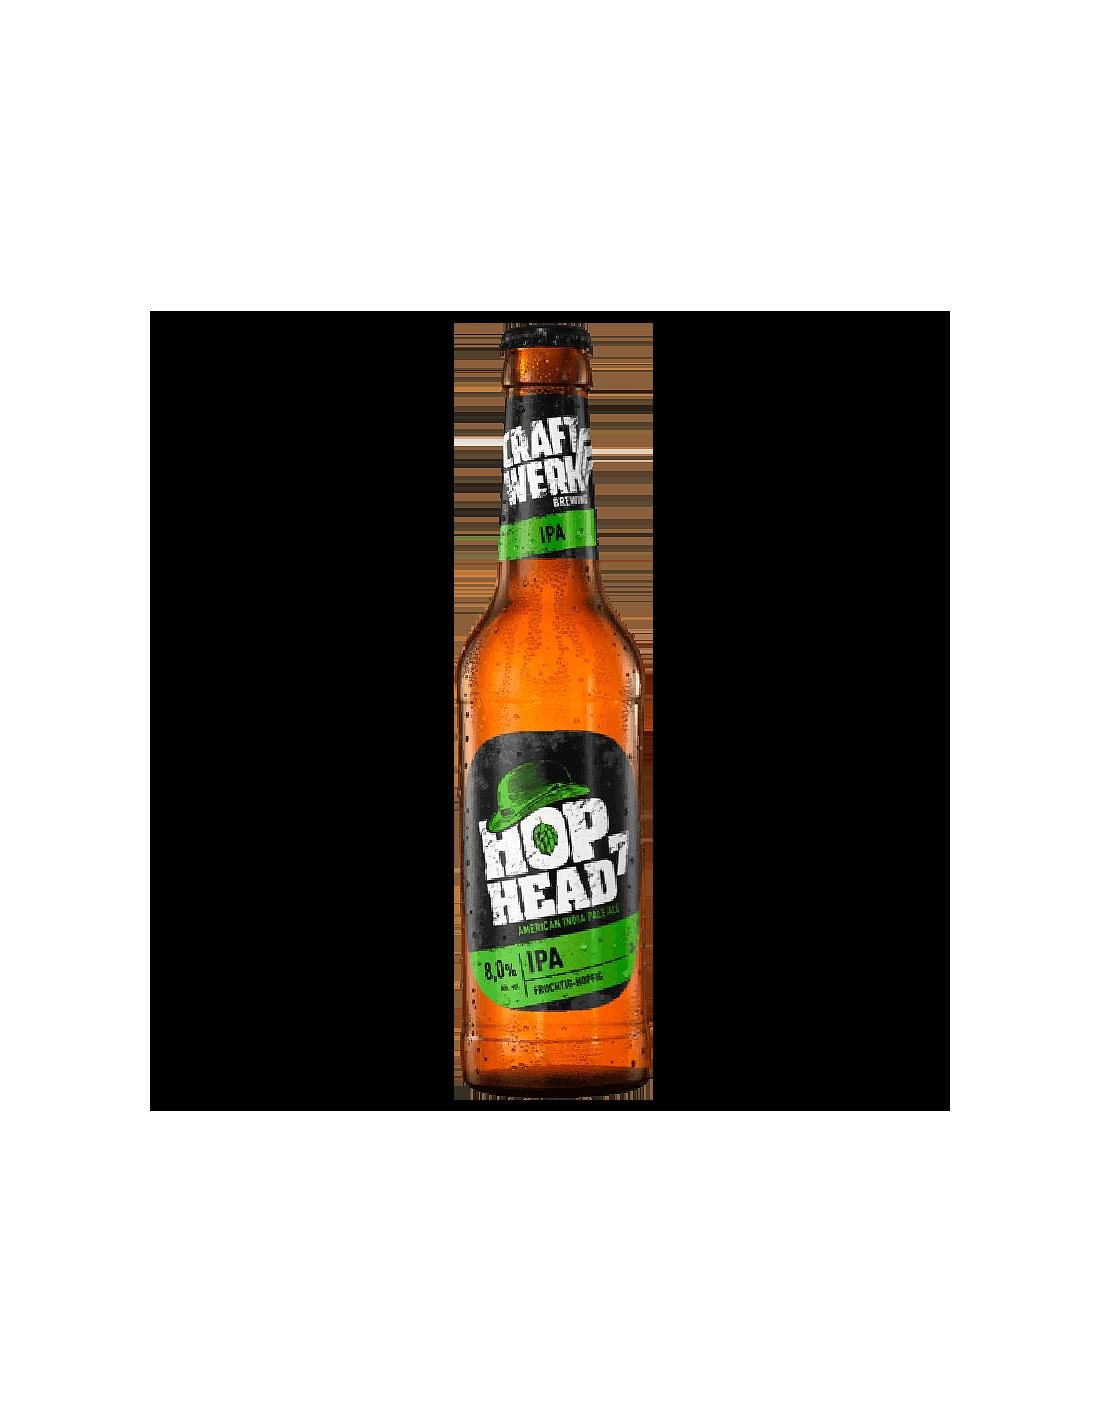 Bere Craft Werk Hop Head IPA sticla, 8% alc., 0.33L, Belgia